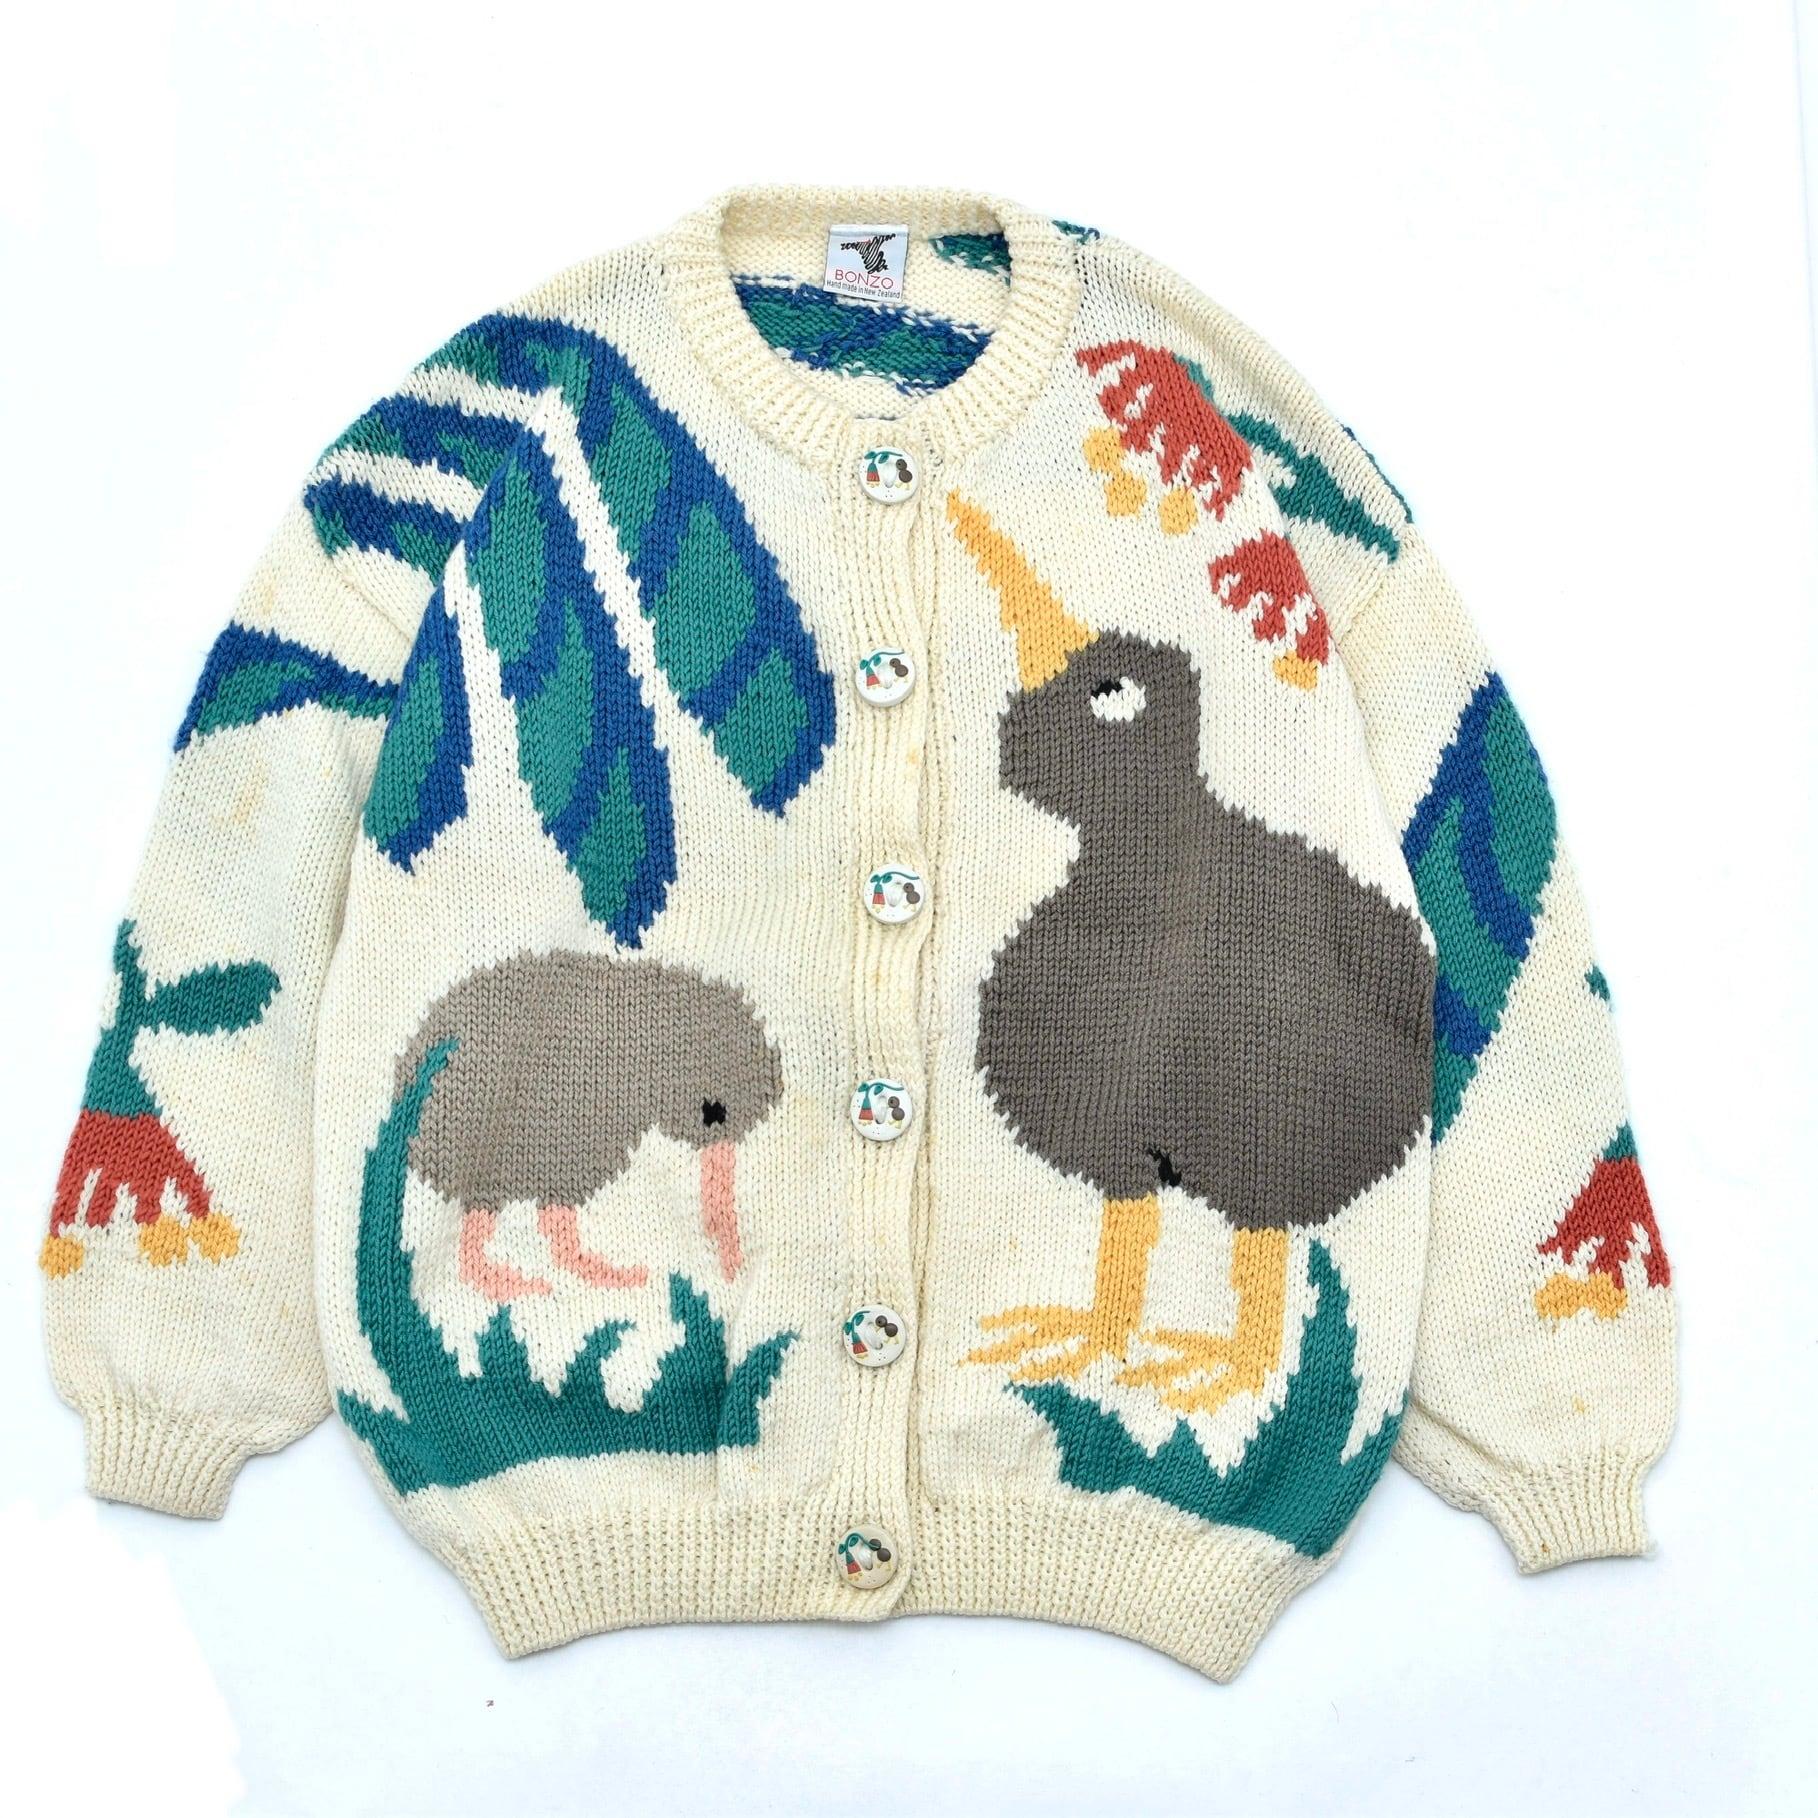 Made in NZ BONZO full pattern cardigan